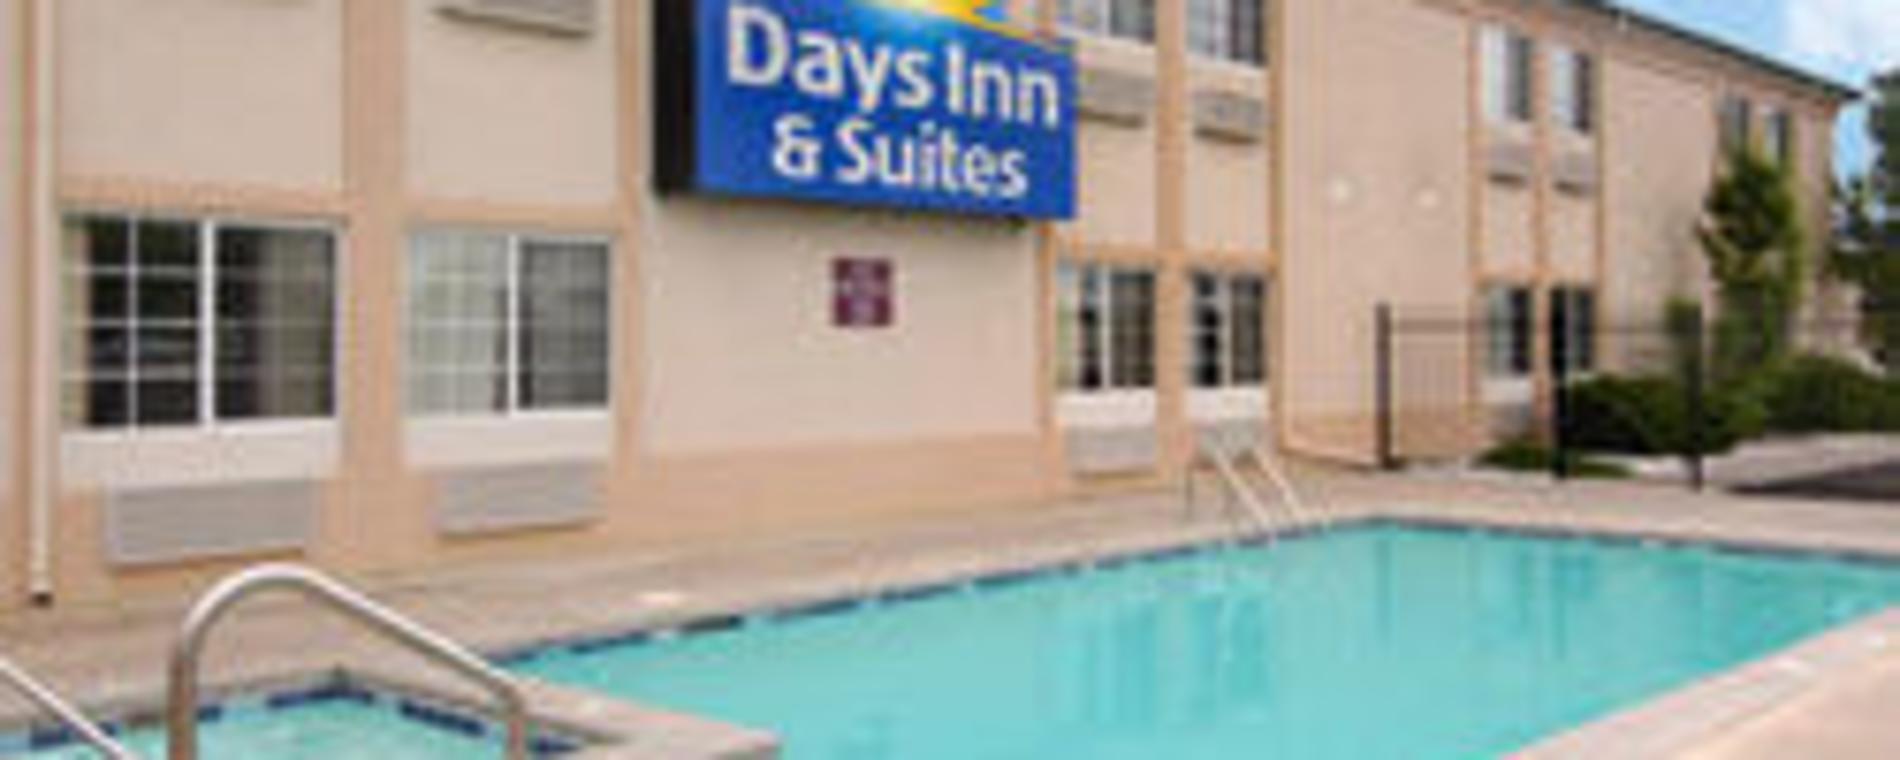 Days Inn South